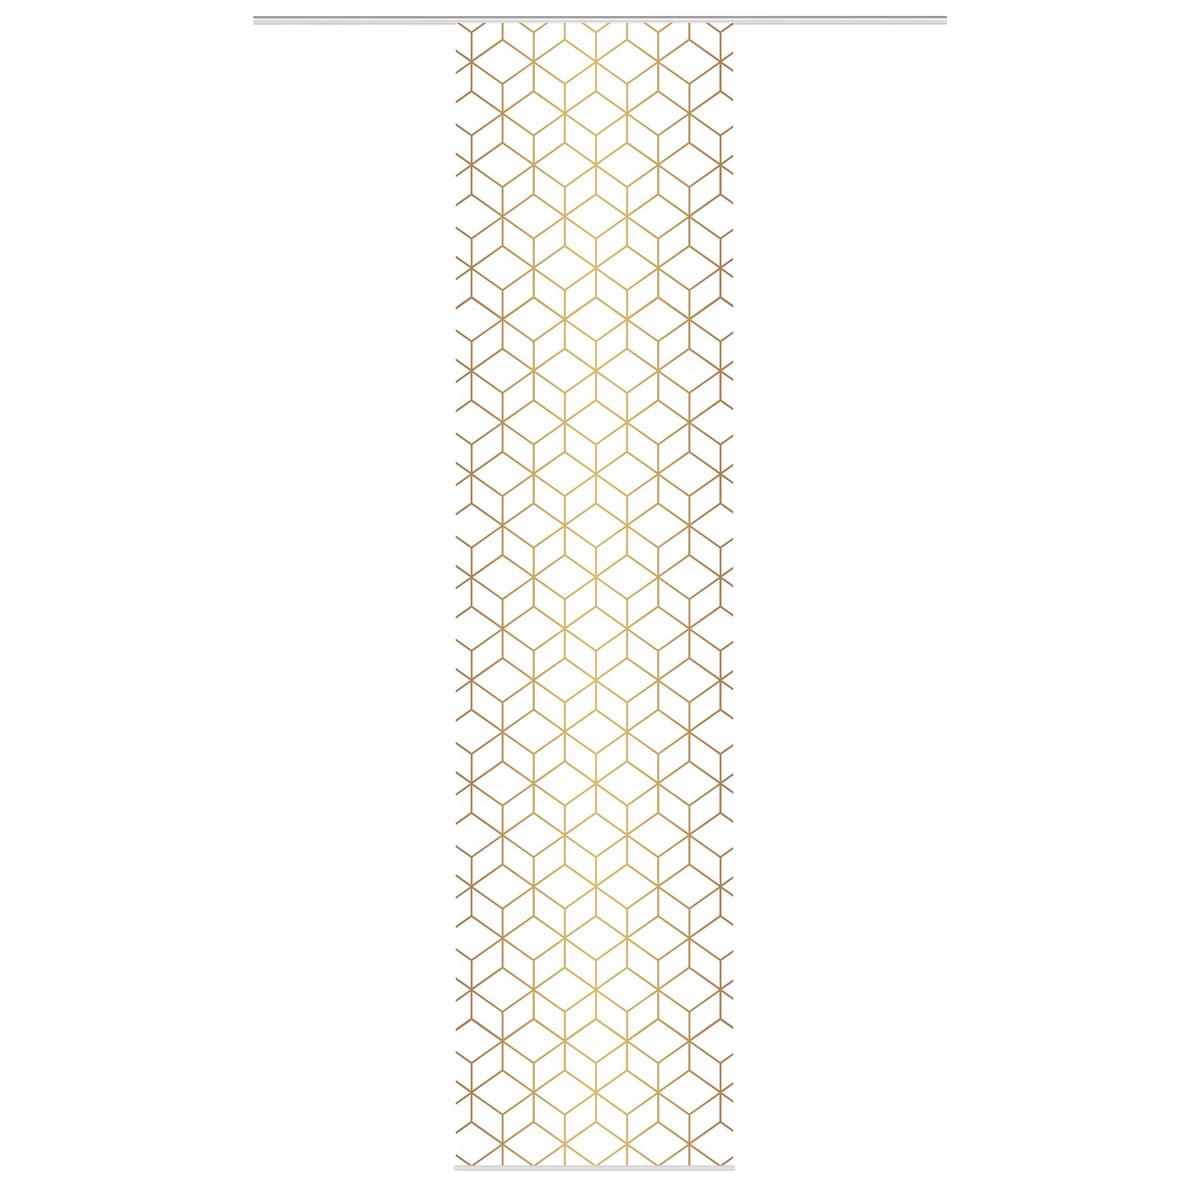 Schiebevorhang Bambusoptik Sesana geometrisch Digitaldruck weiß gold kürzbar 60x260cm